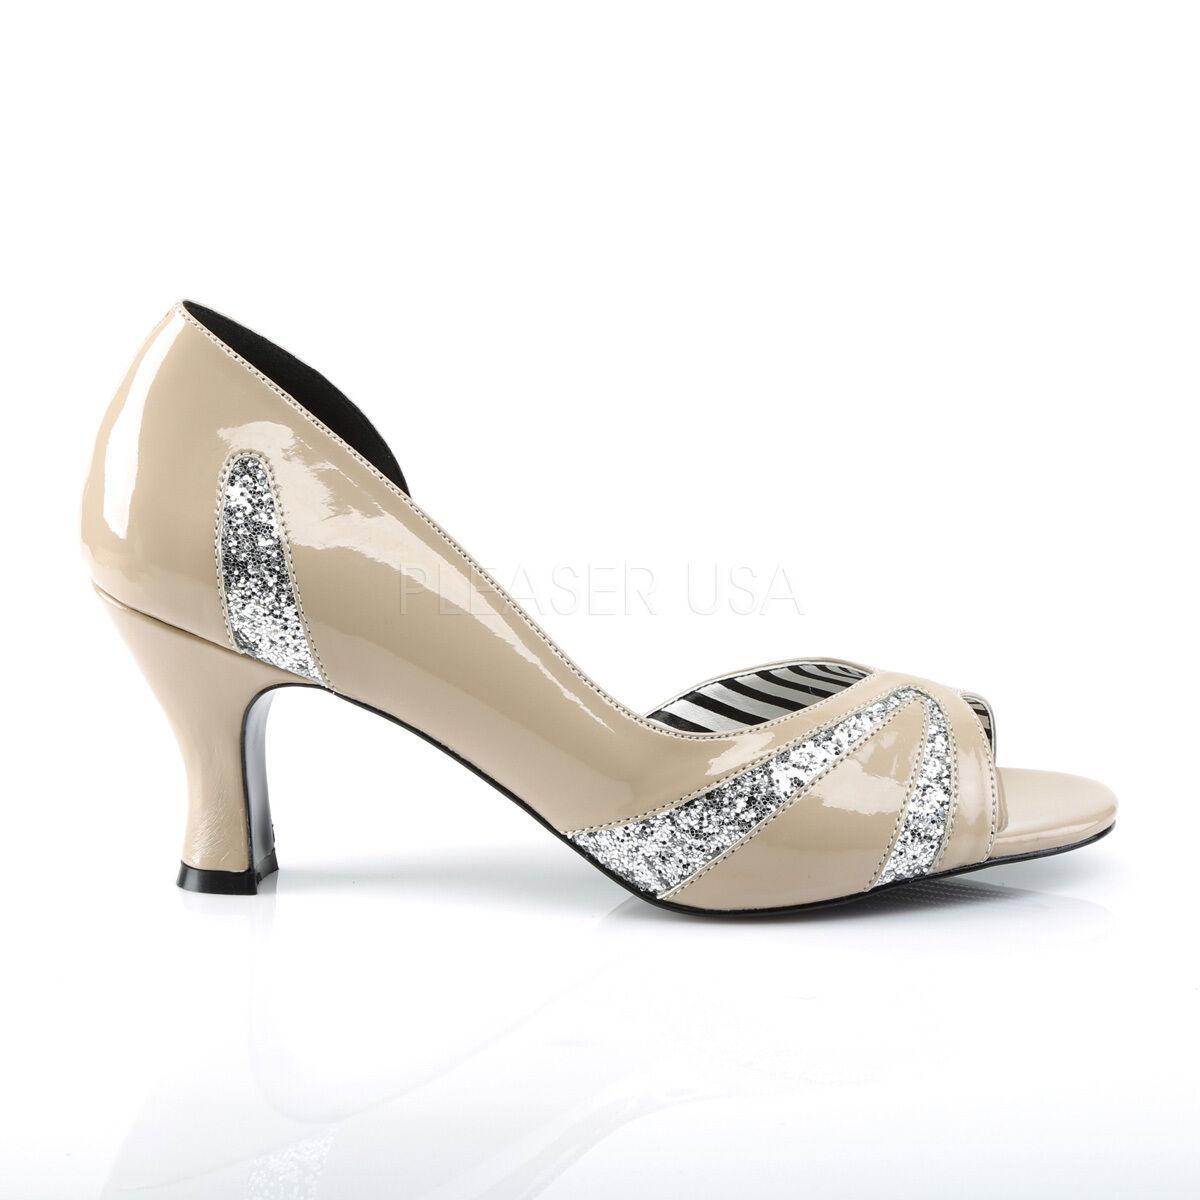 Sexy 3  High Heel Cream Peep Toe Toe Toe D'Orsay Pumps schuhe Cut w  Silber Glitters 07cf14